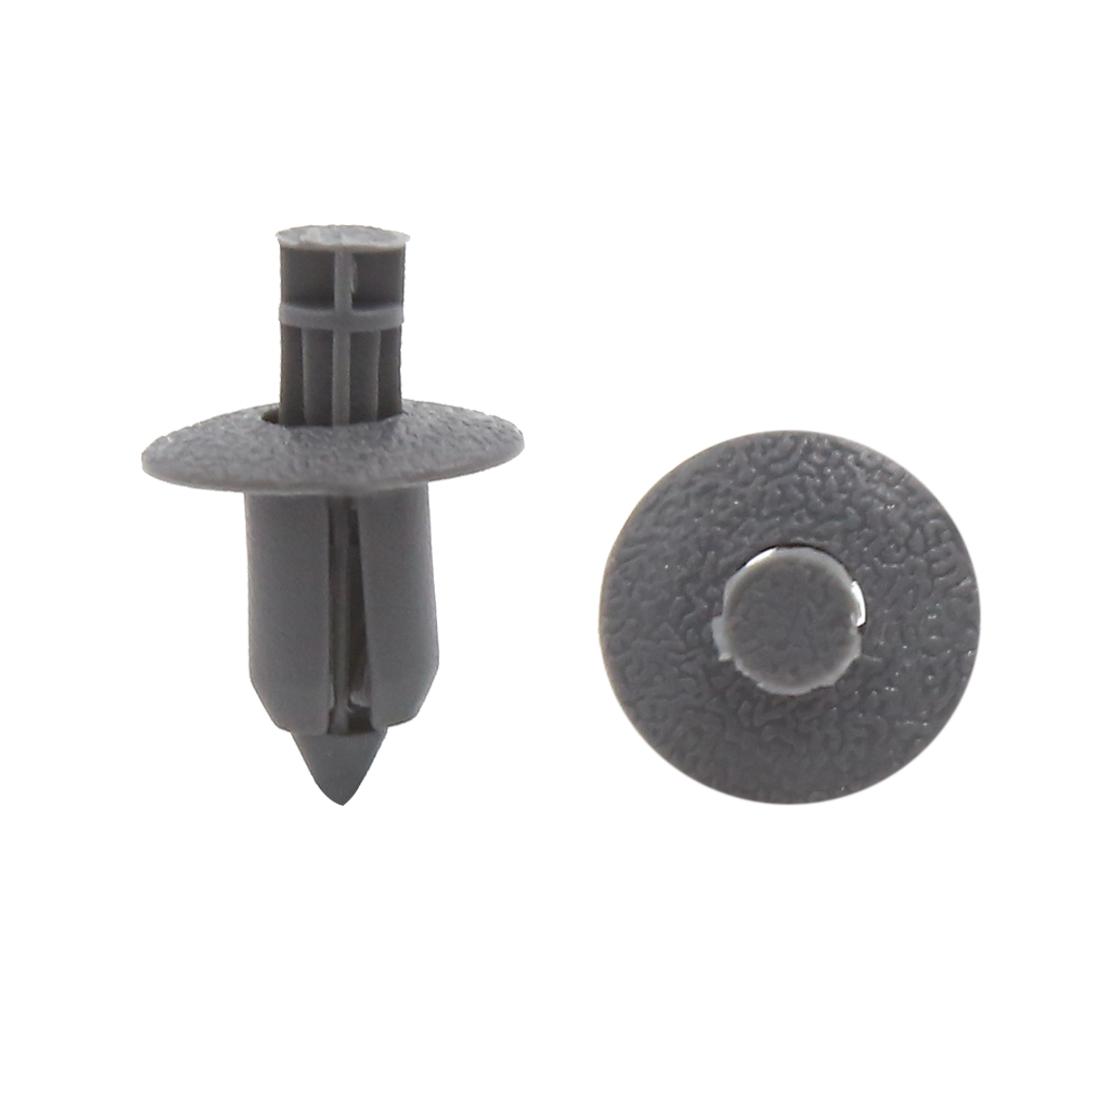 30Pcs 8mm Hole Plastic Push Type Rivet Fastener Door Bumper Pin Clips Gray